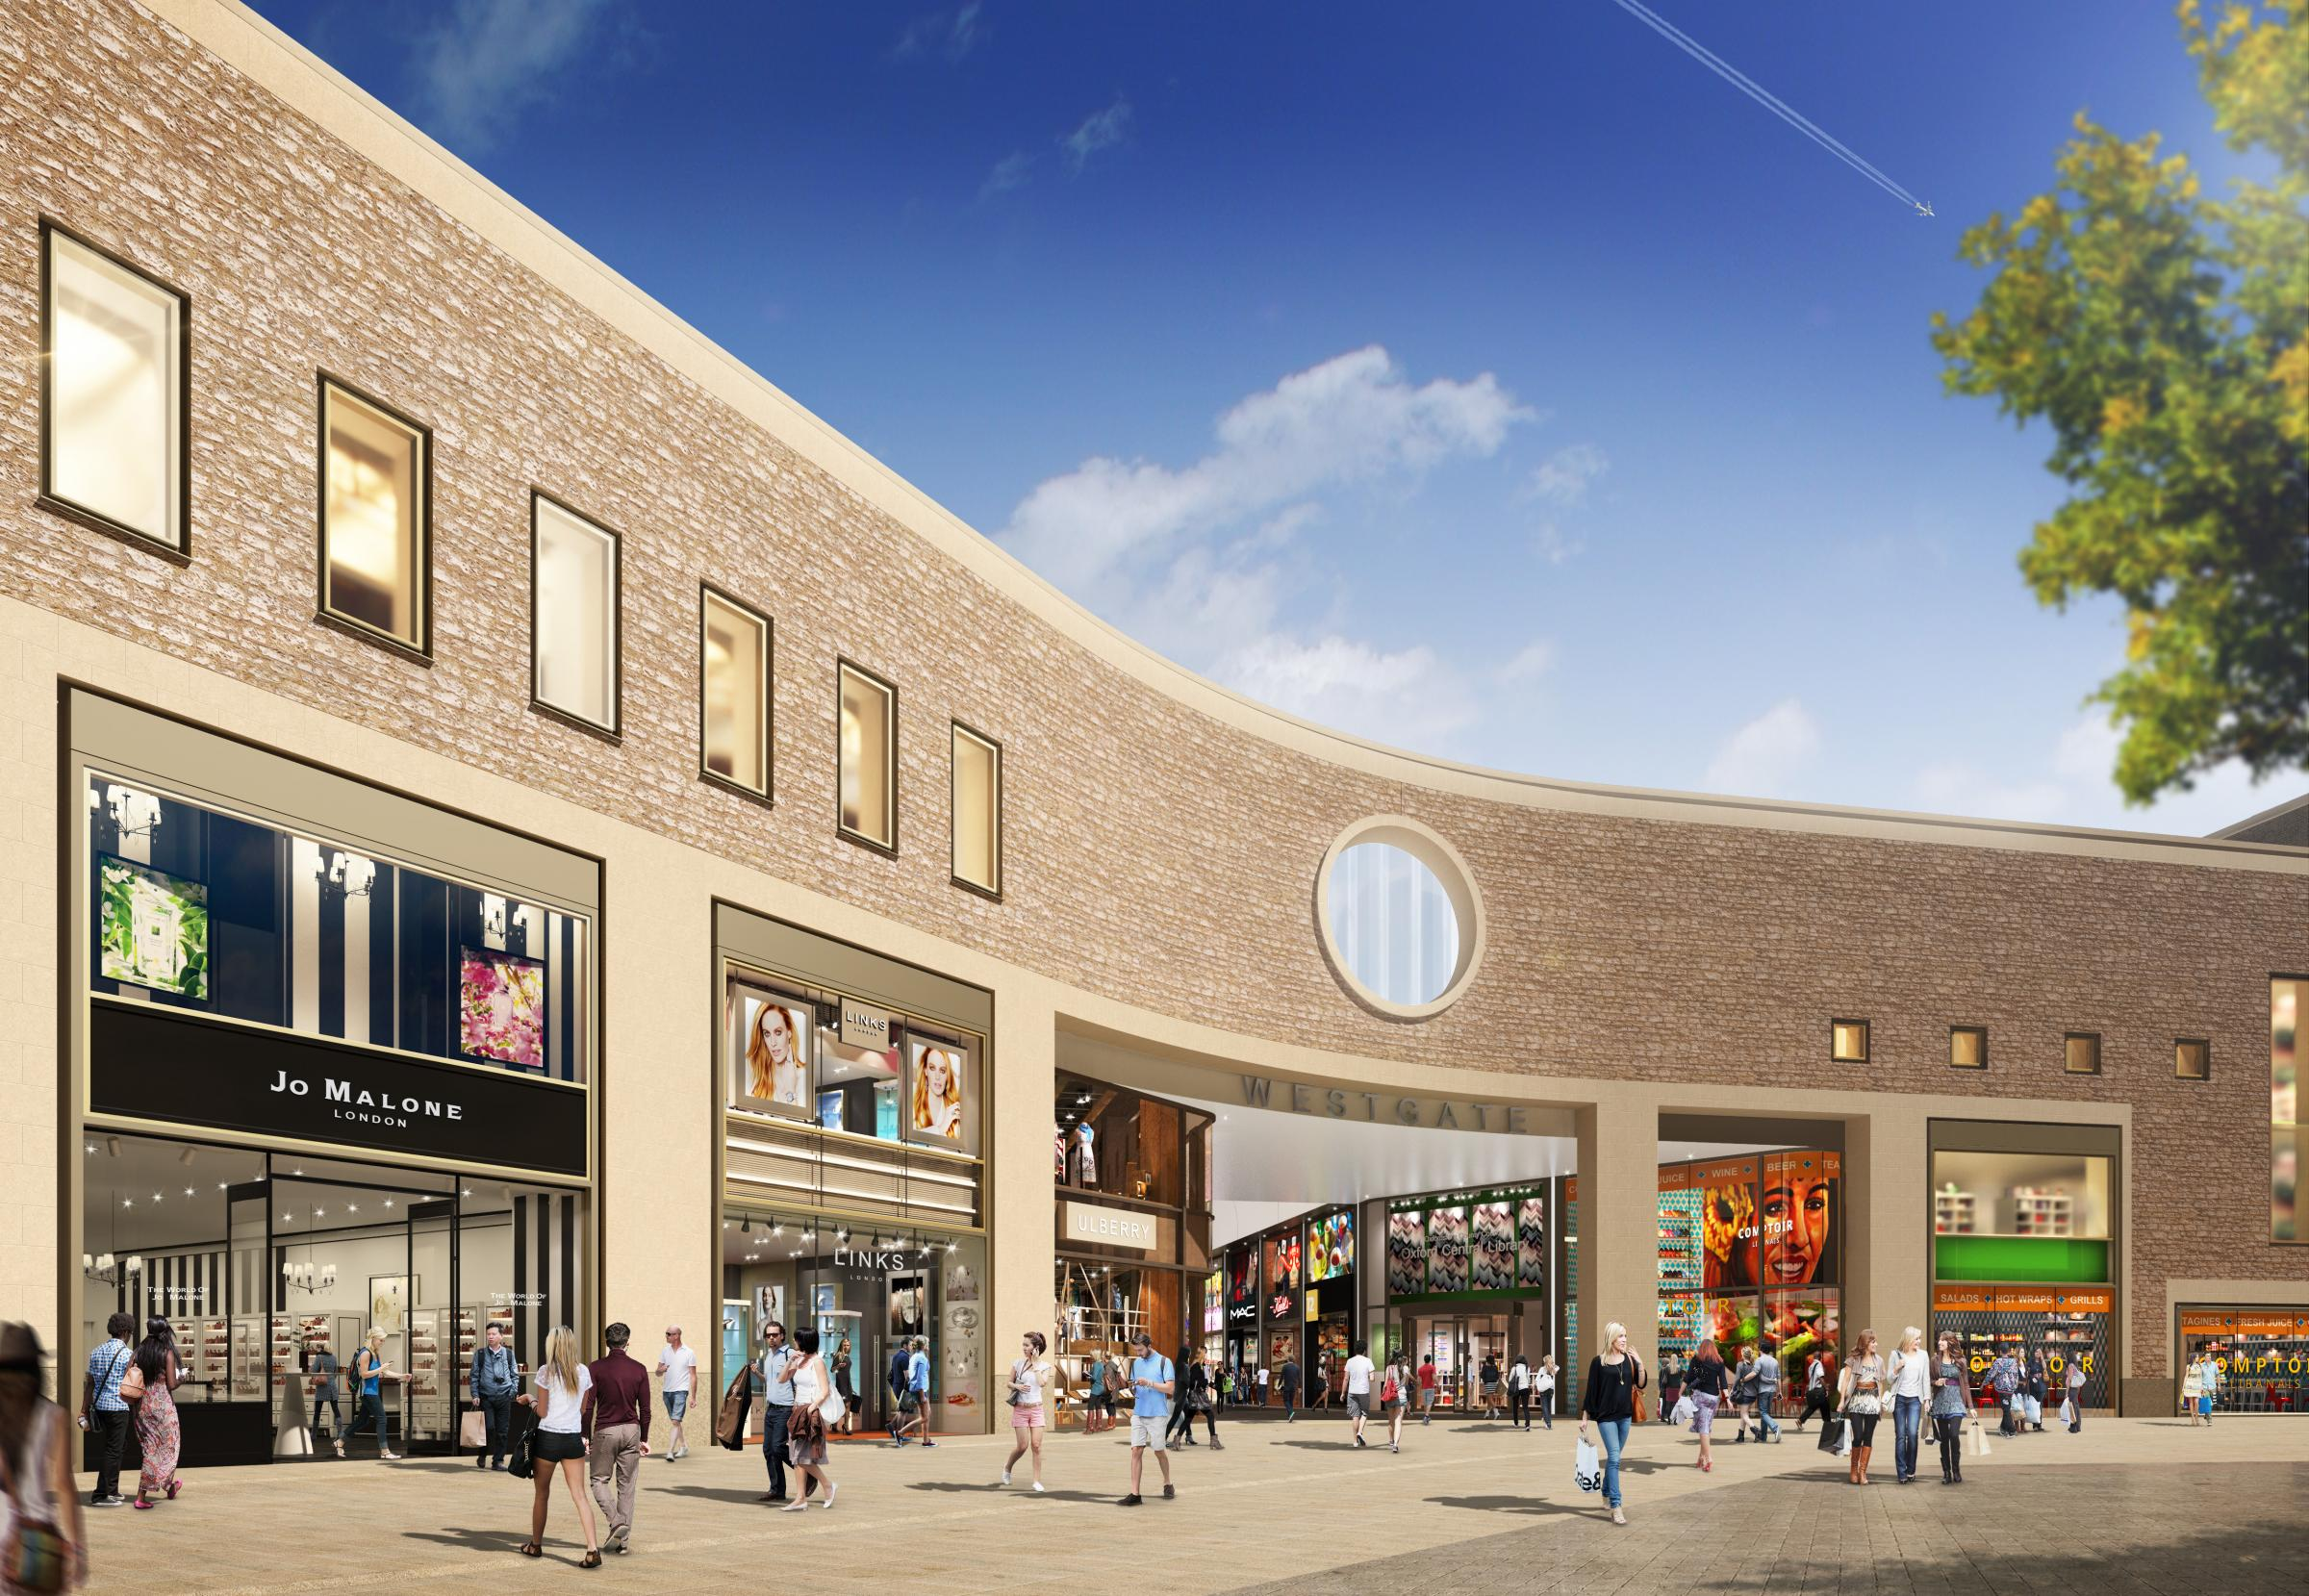 Superior photo westgate shopping centre Superior Photo Westgate Shopping Centre Passport Photo Visa